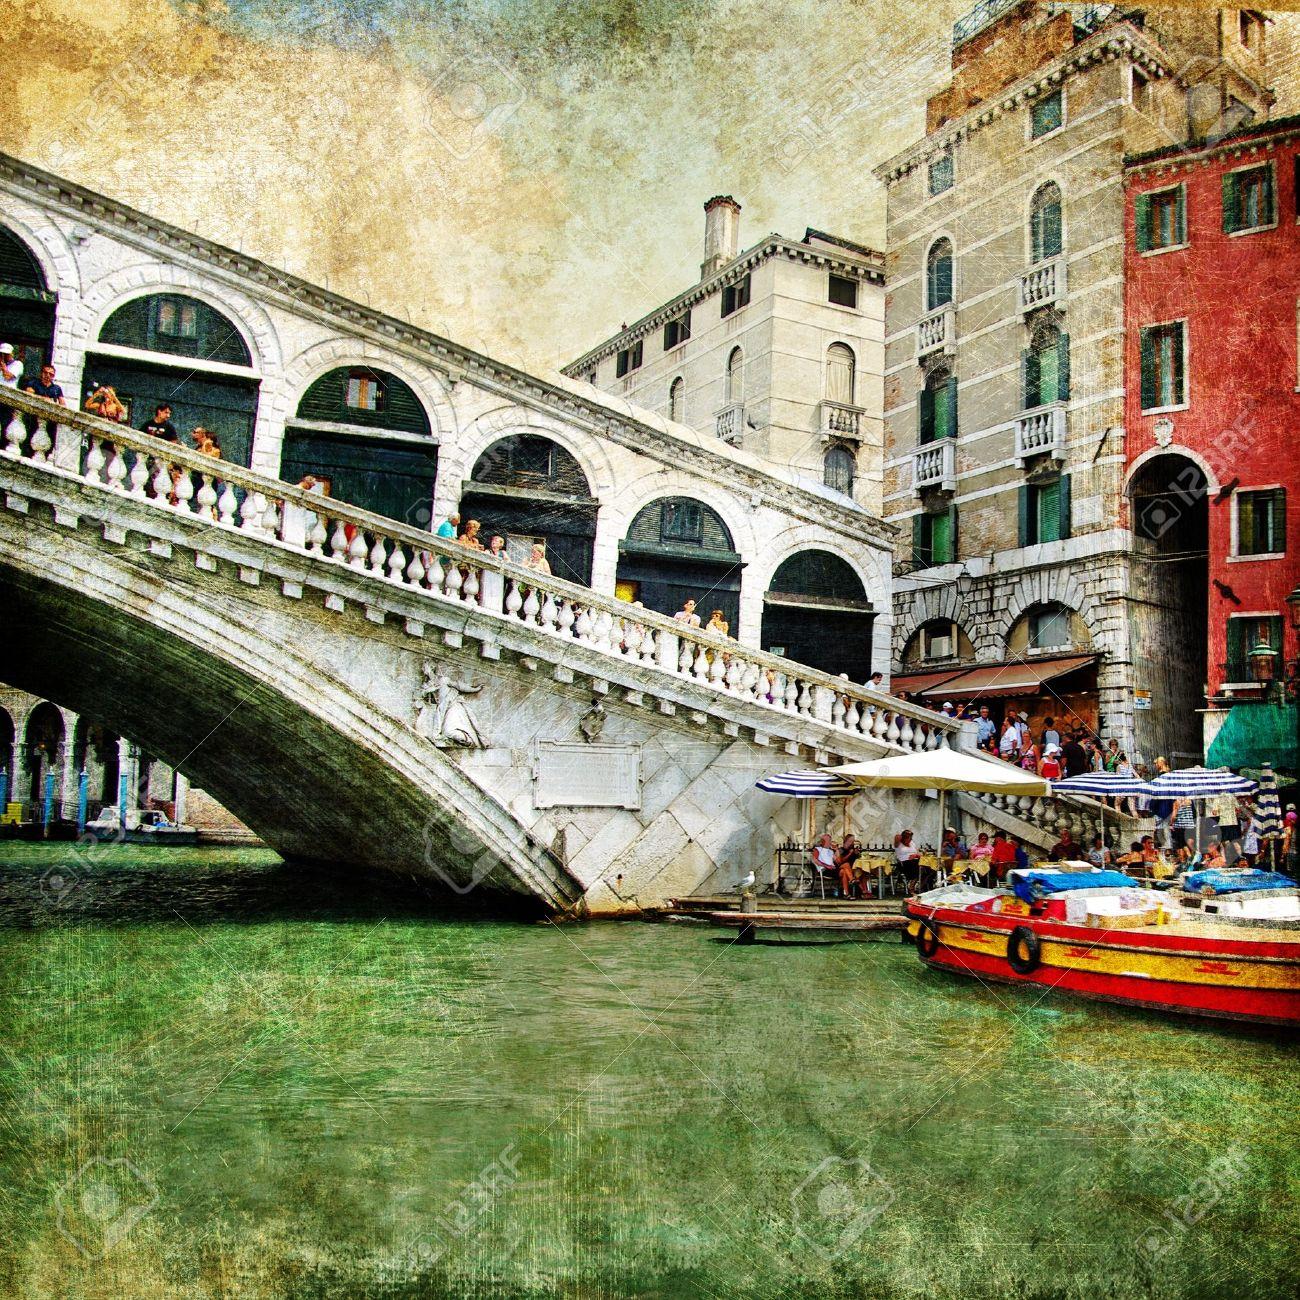 colors of beautiful Venice - artwork in painting style - Rialto bridge Stock Photo - 8538453